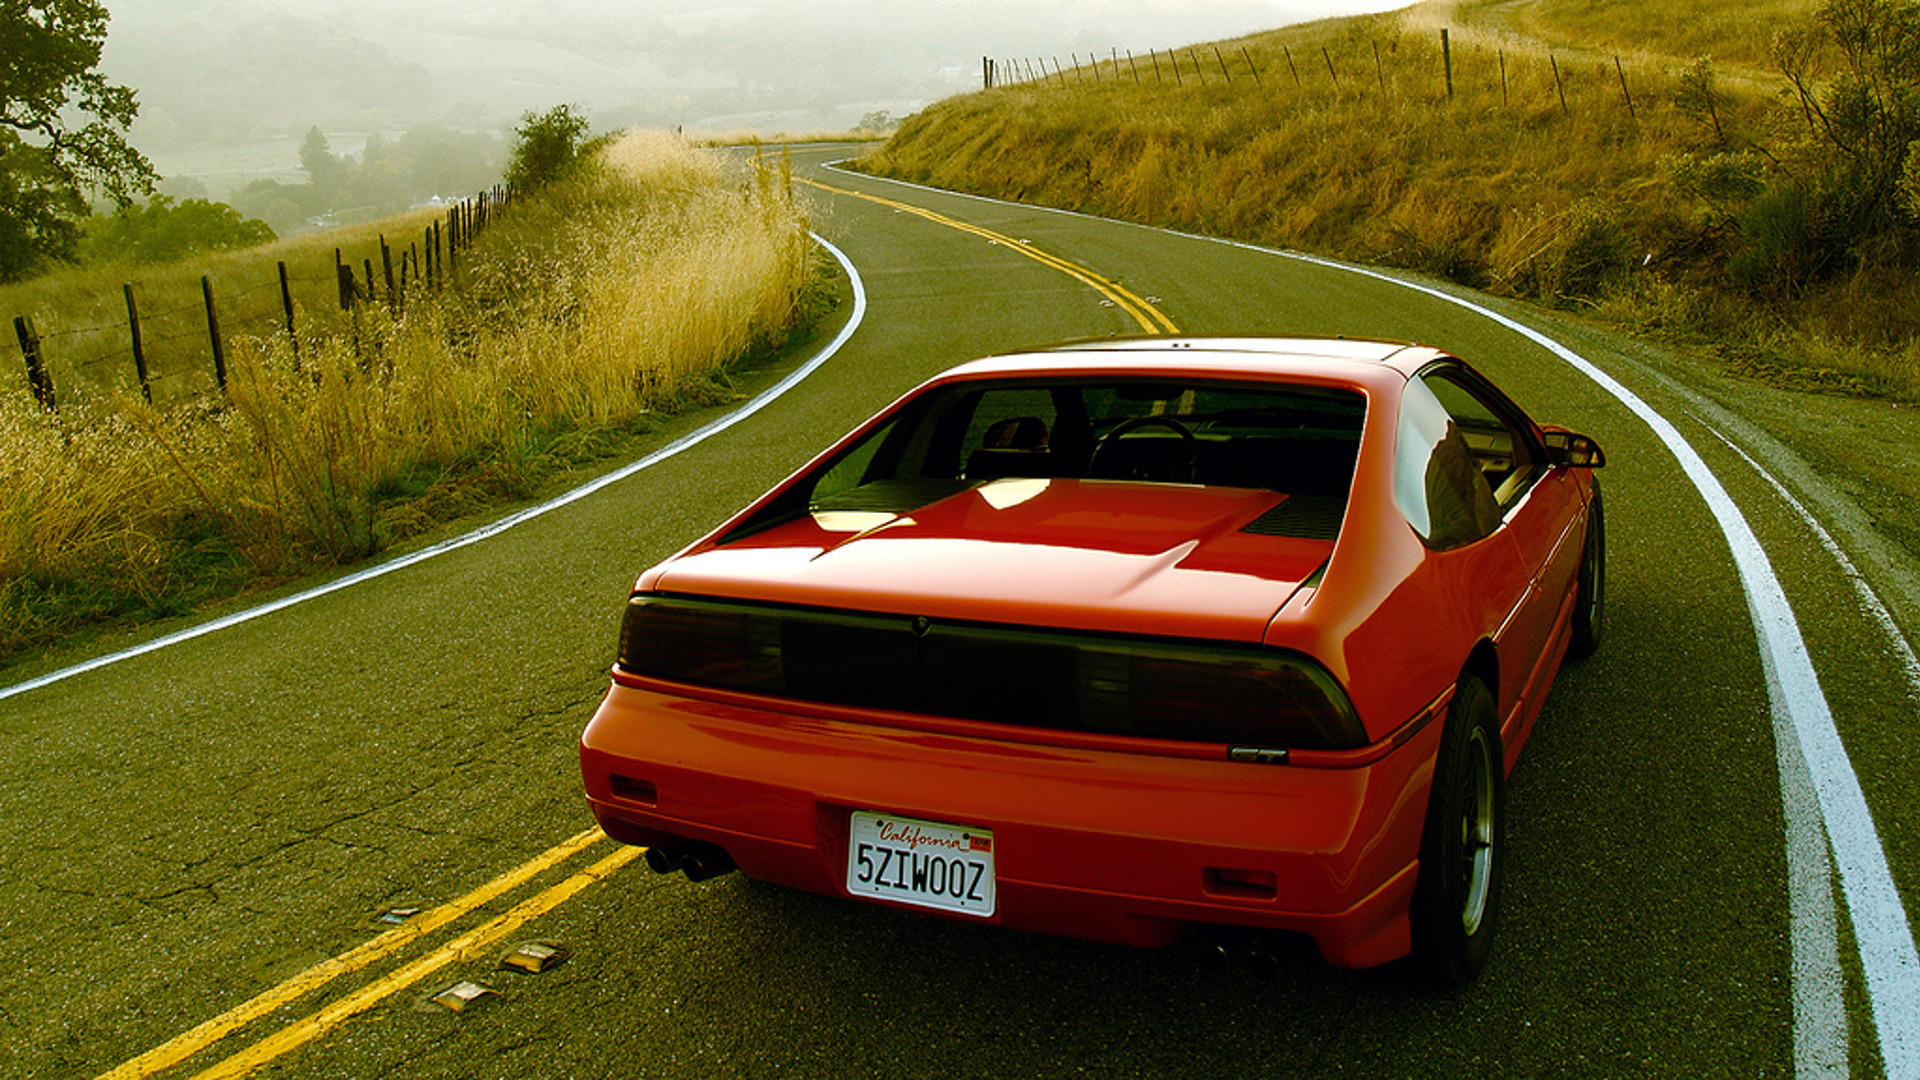 Worst Sports Cars Pontiac Fiero Iron Duke Engine Gm Performance Parts